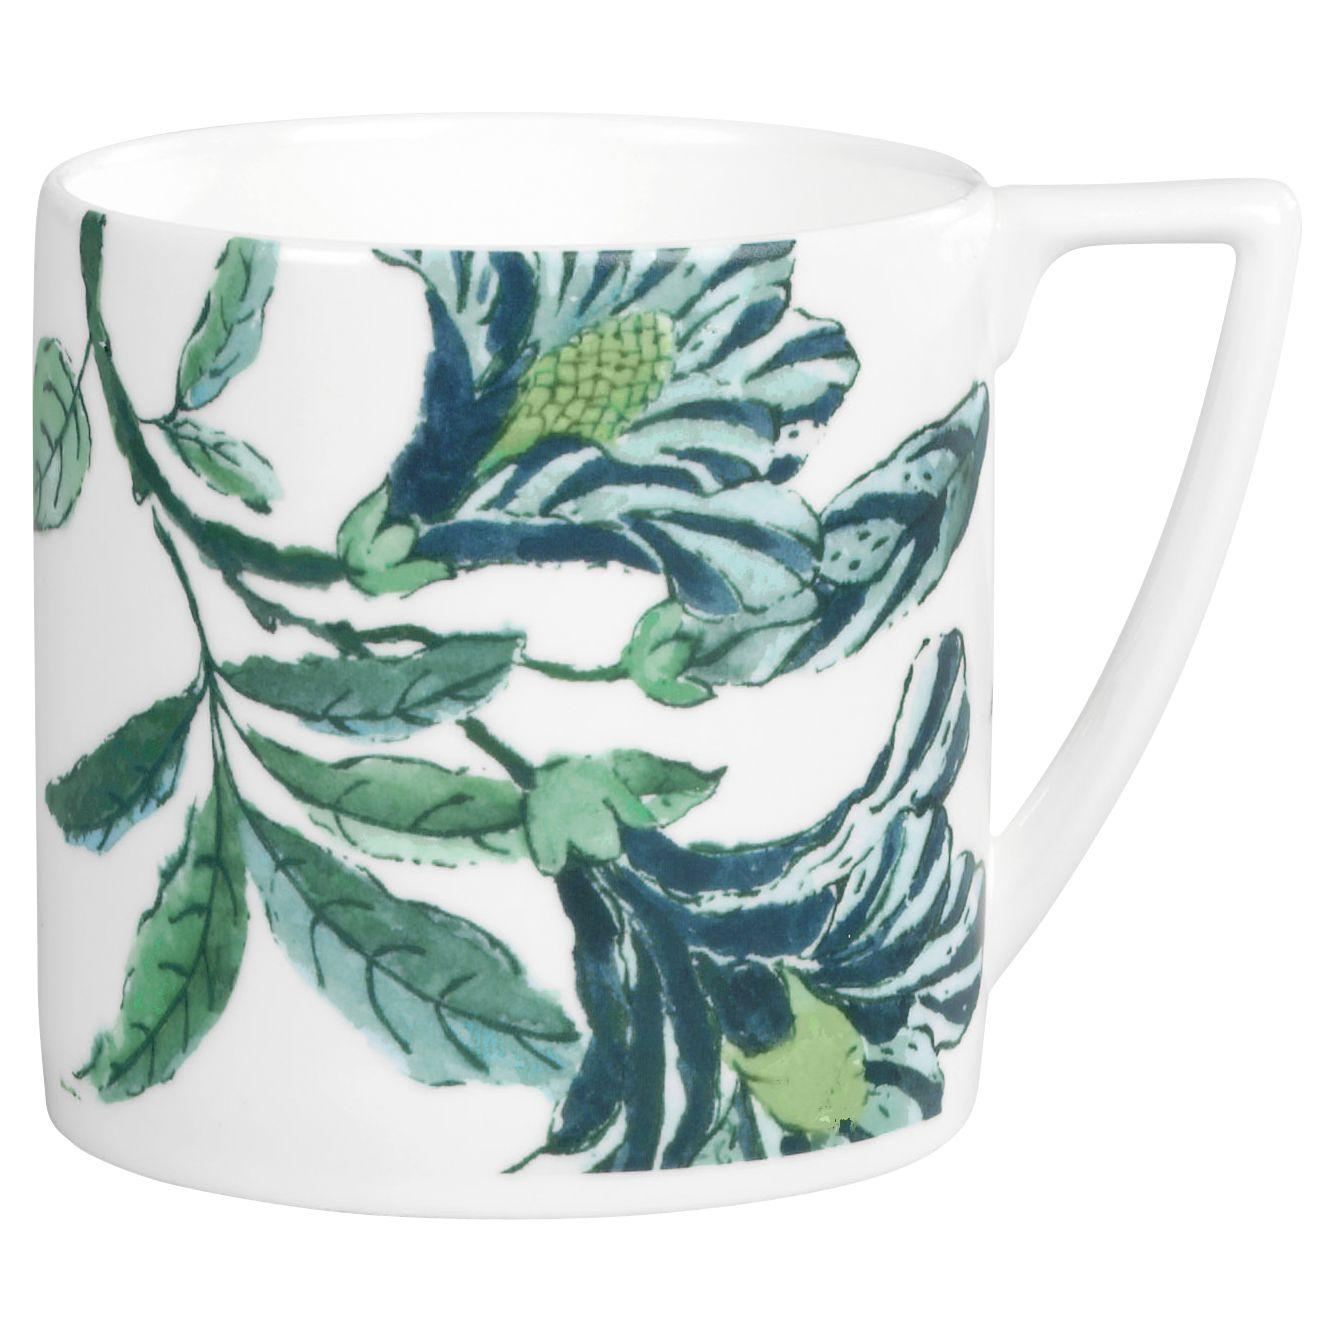 Jasper Conran Jasper Conran for Wedgwood Chinoiserie Mini Mug, Boxed